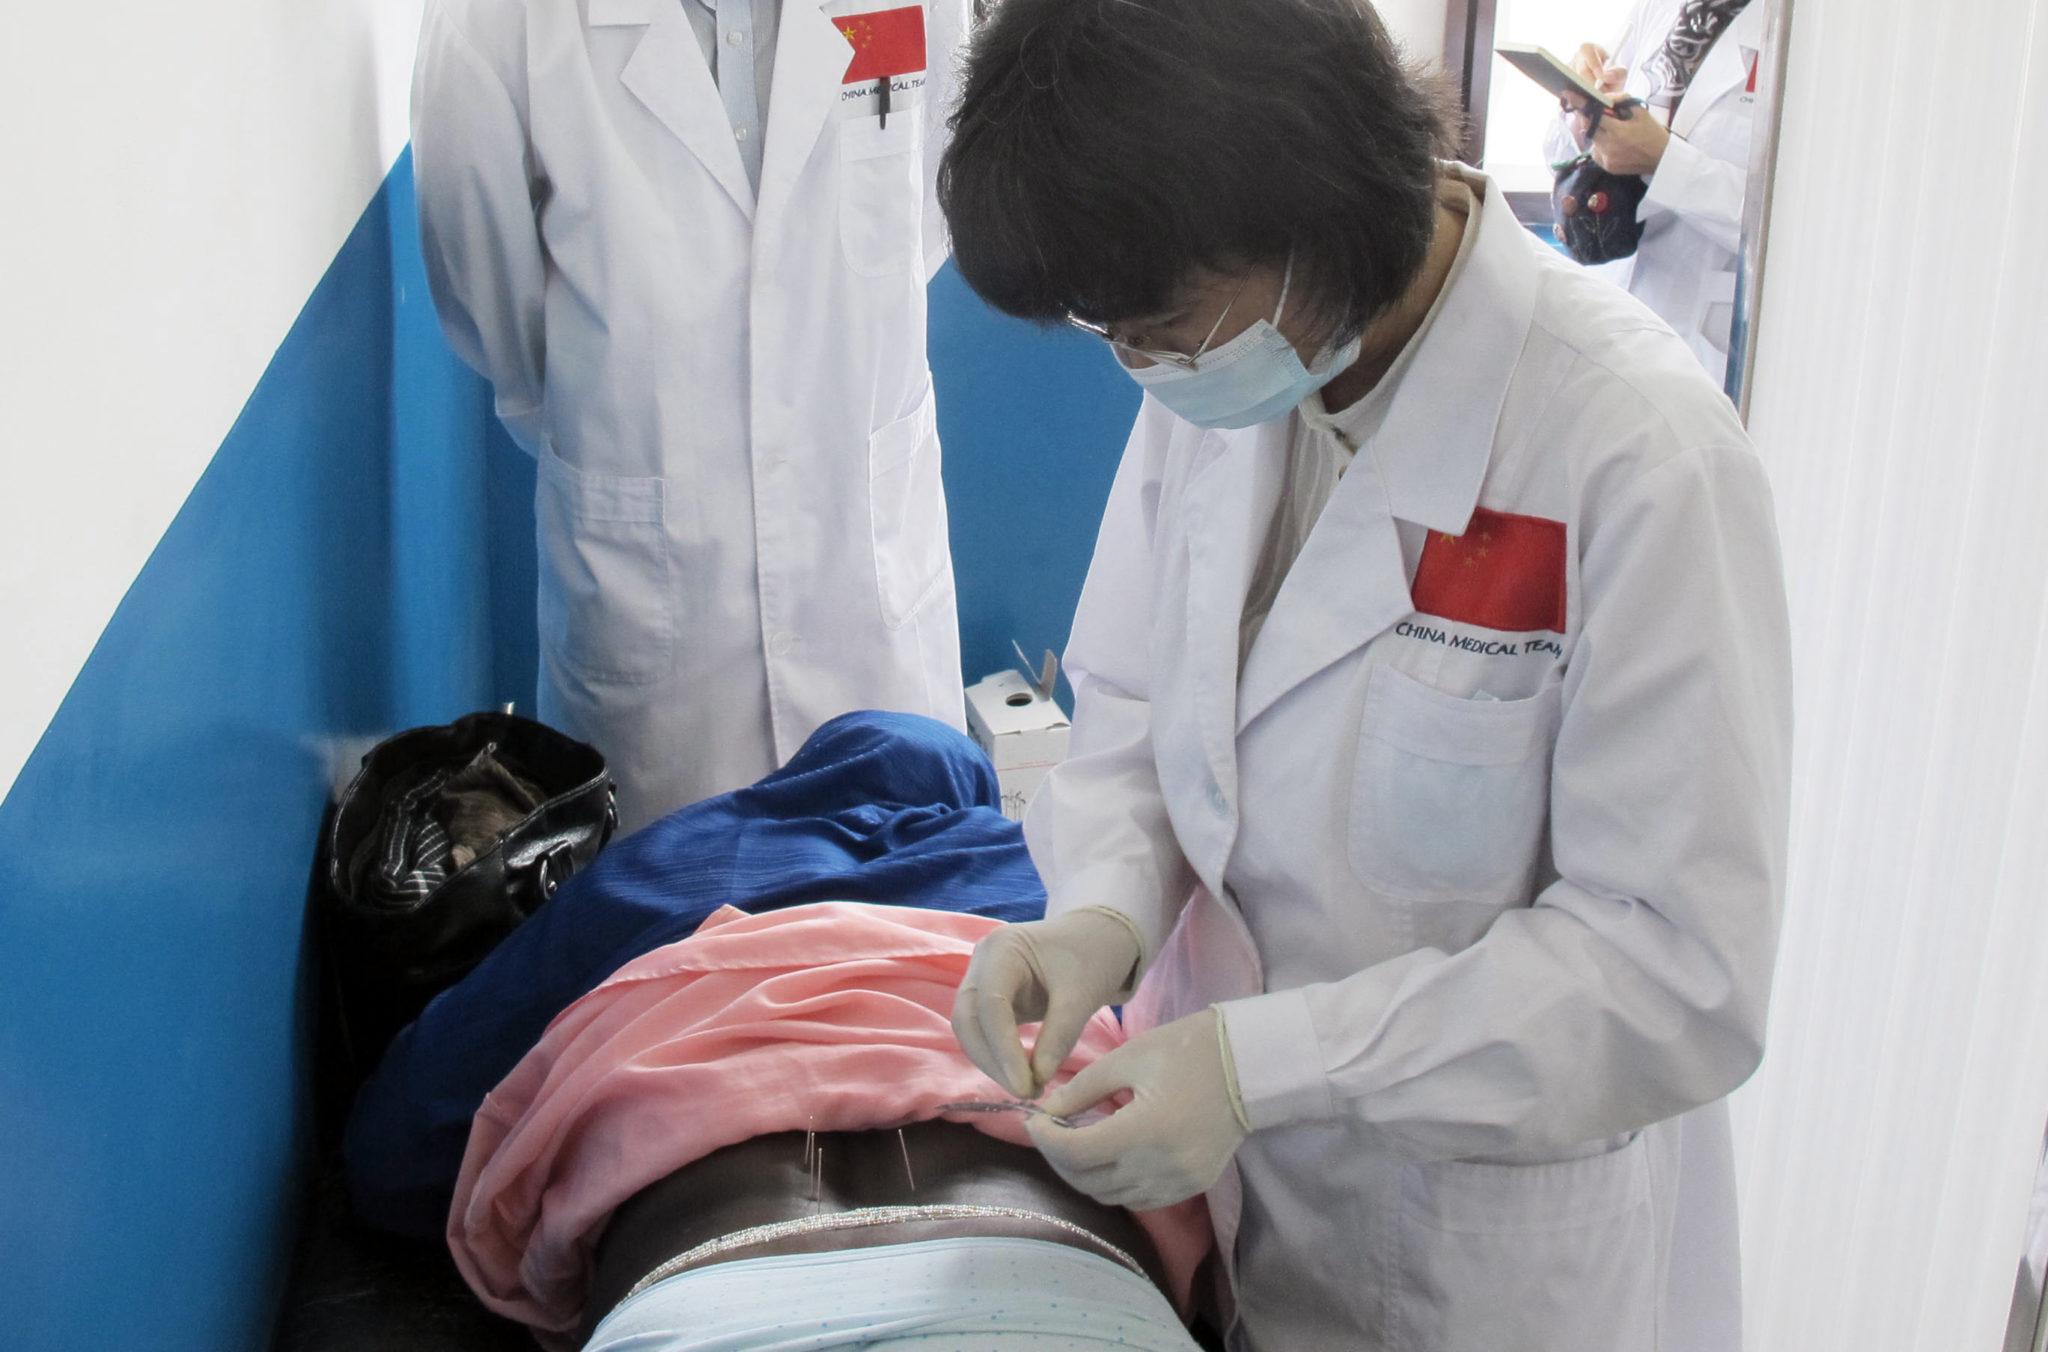 Medicina tradicional chinesa | Aprovada na generalidade lei que regula licenciamento